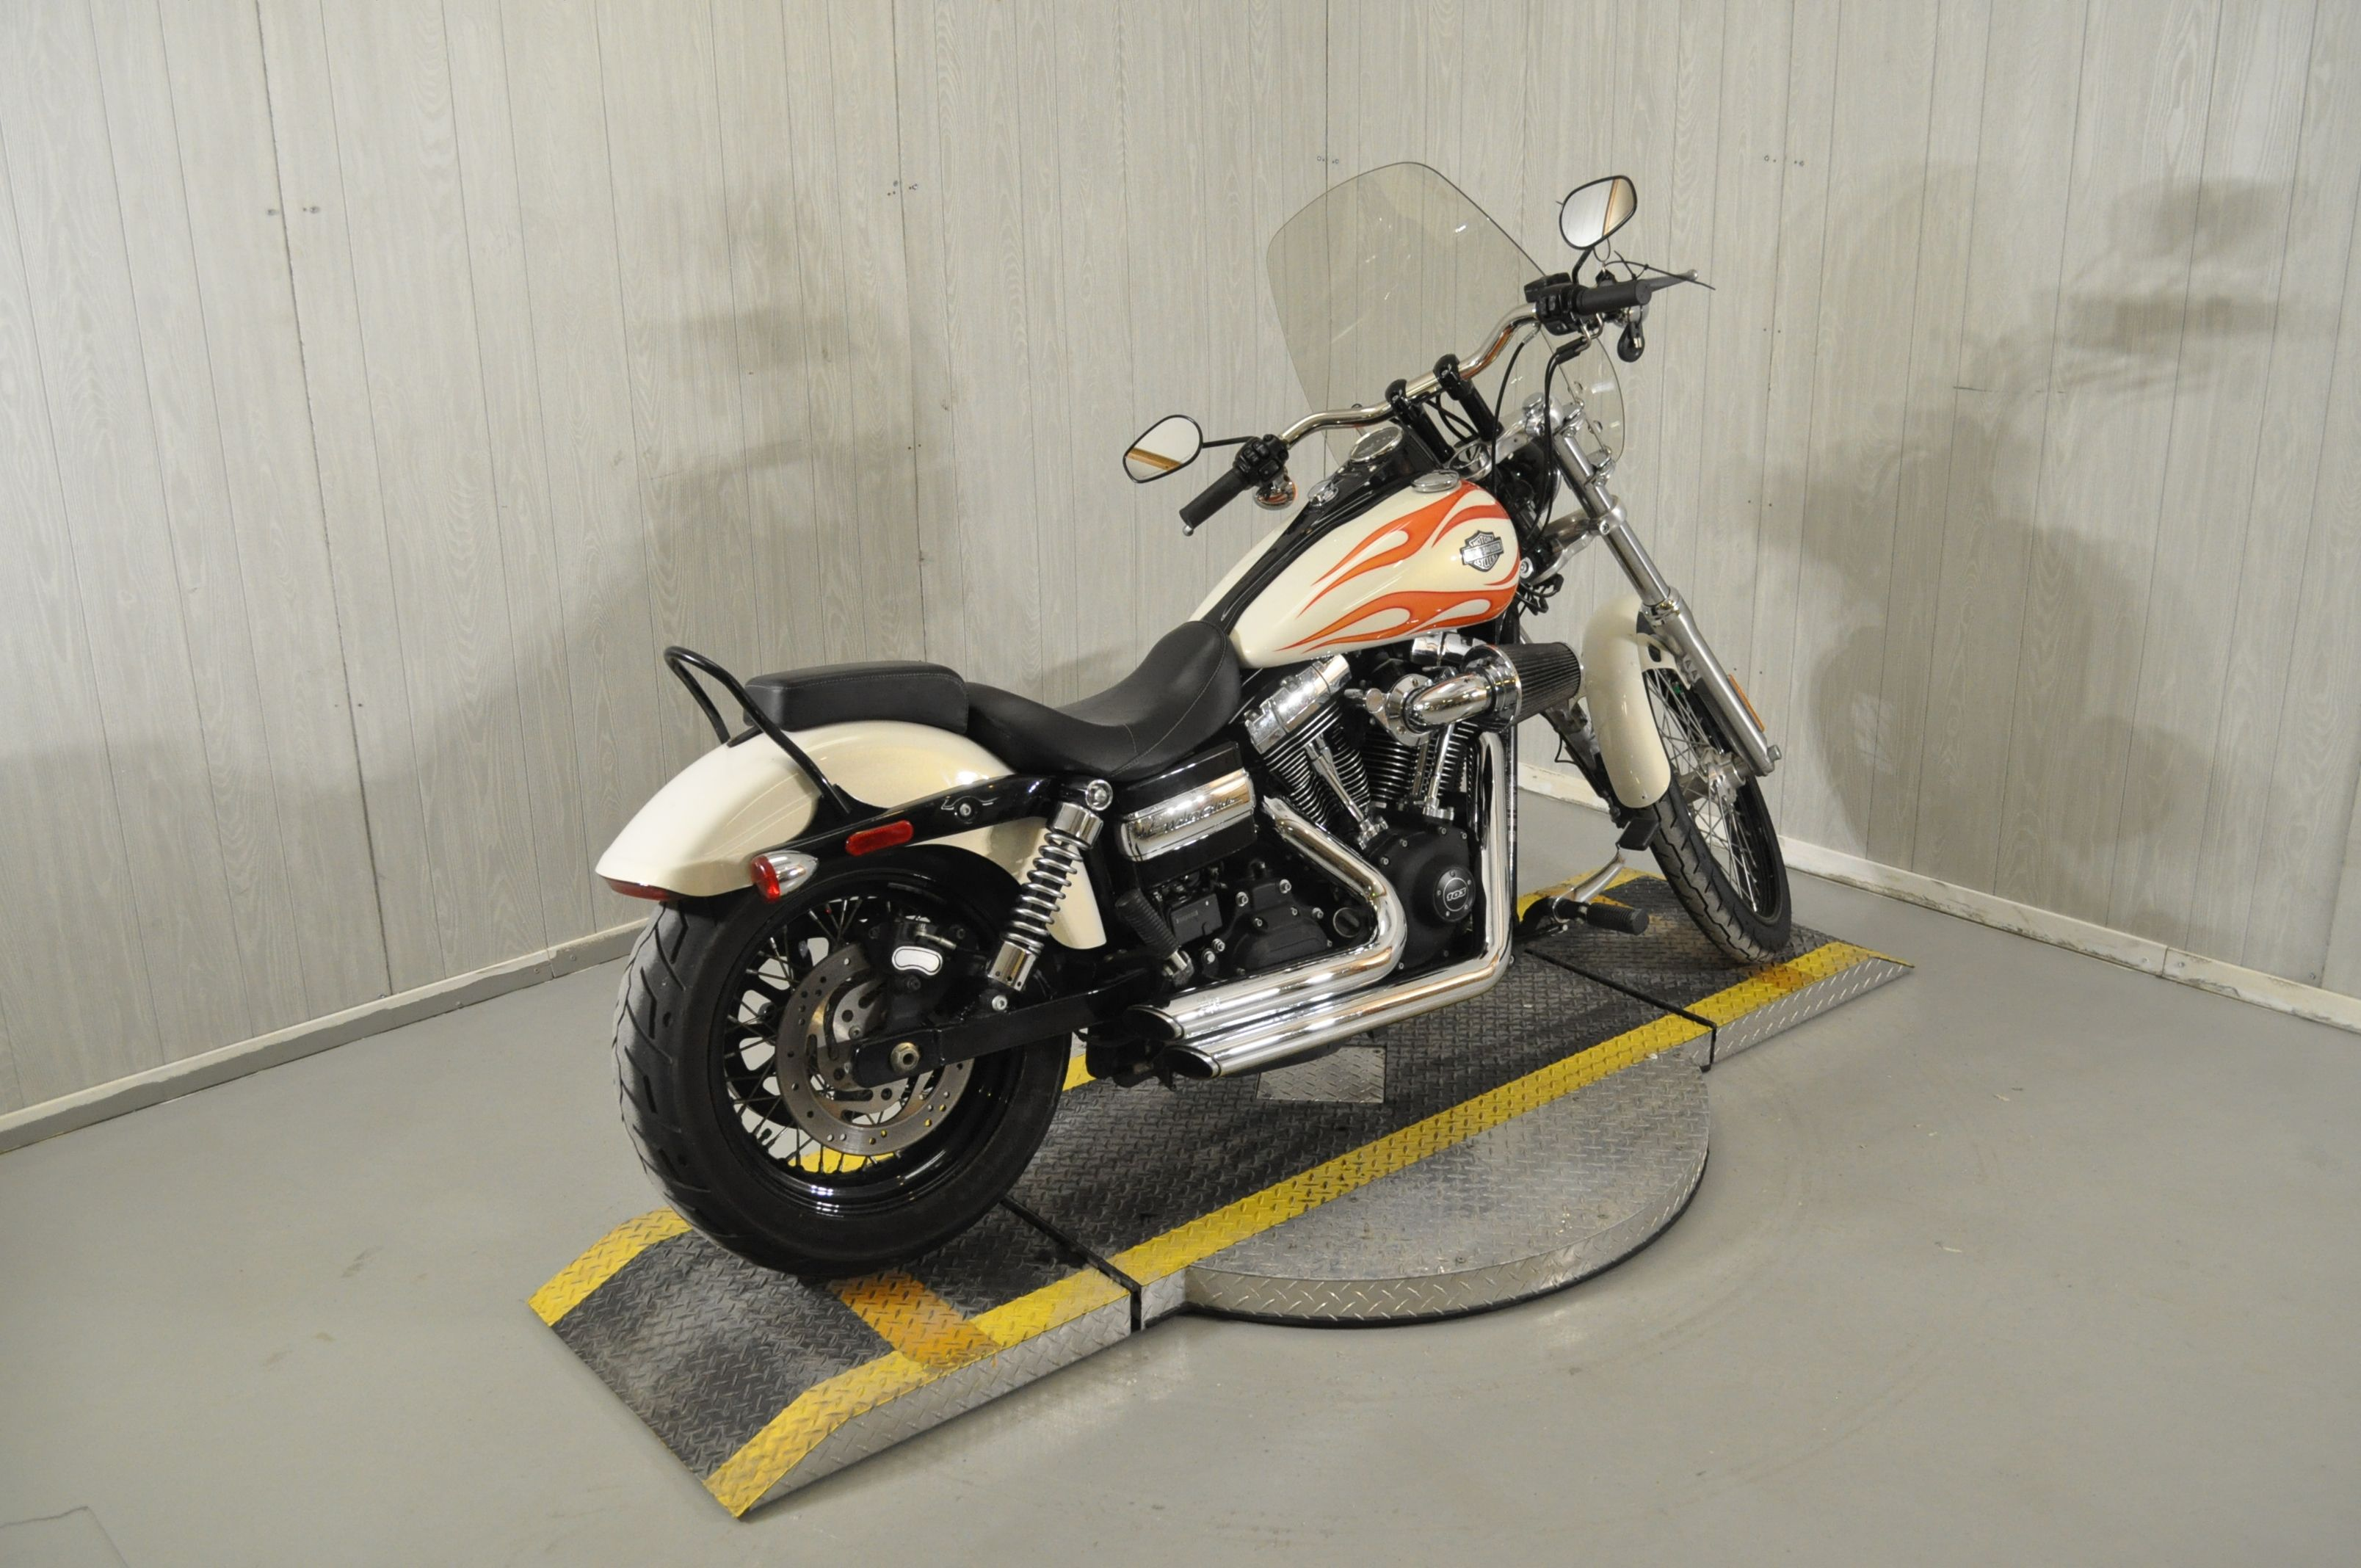 Pre-Owned 2014 Harley-Davidson Wide Glide FXDWG